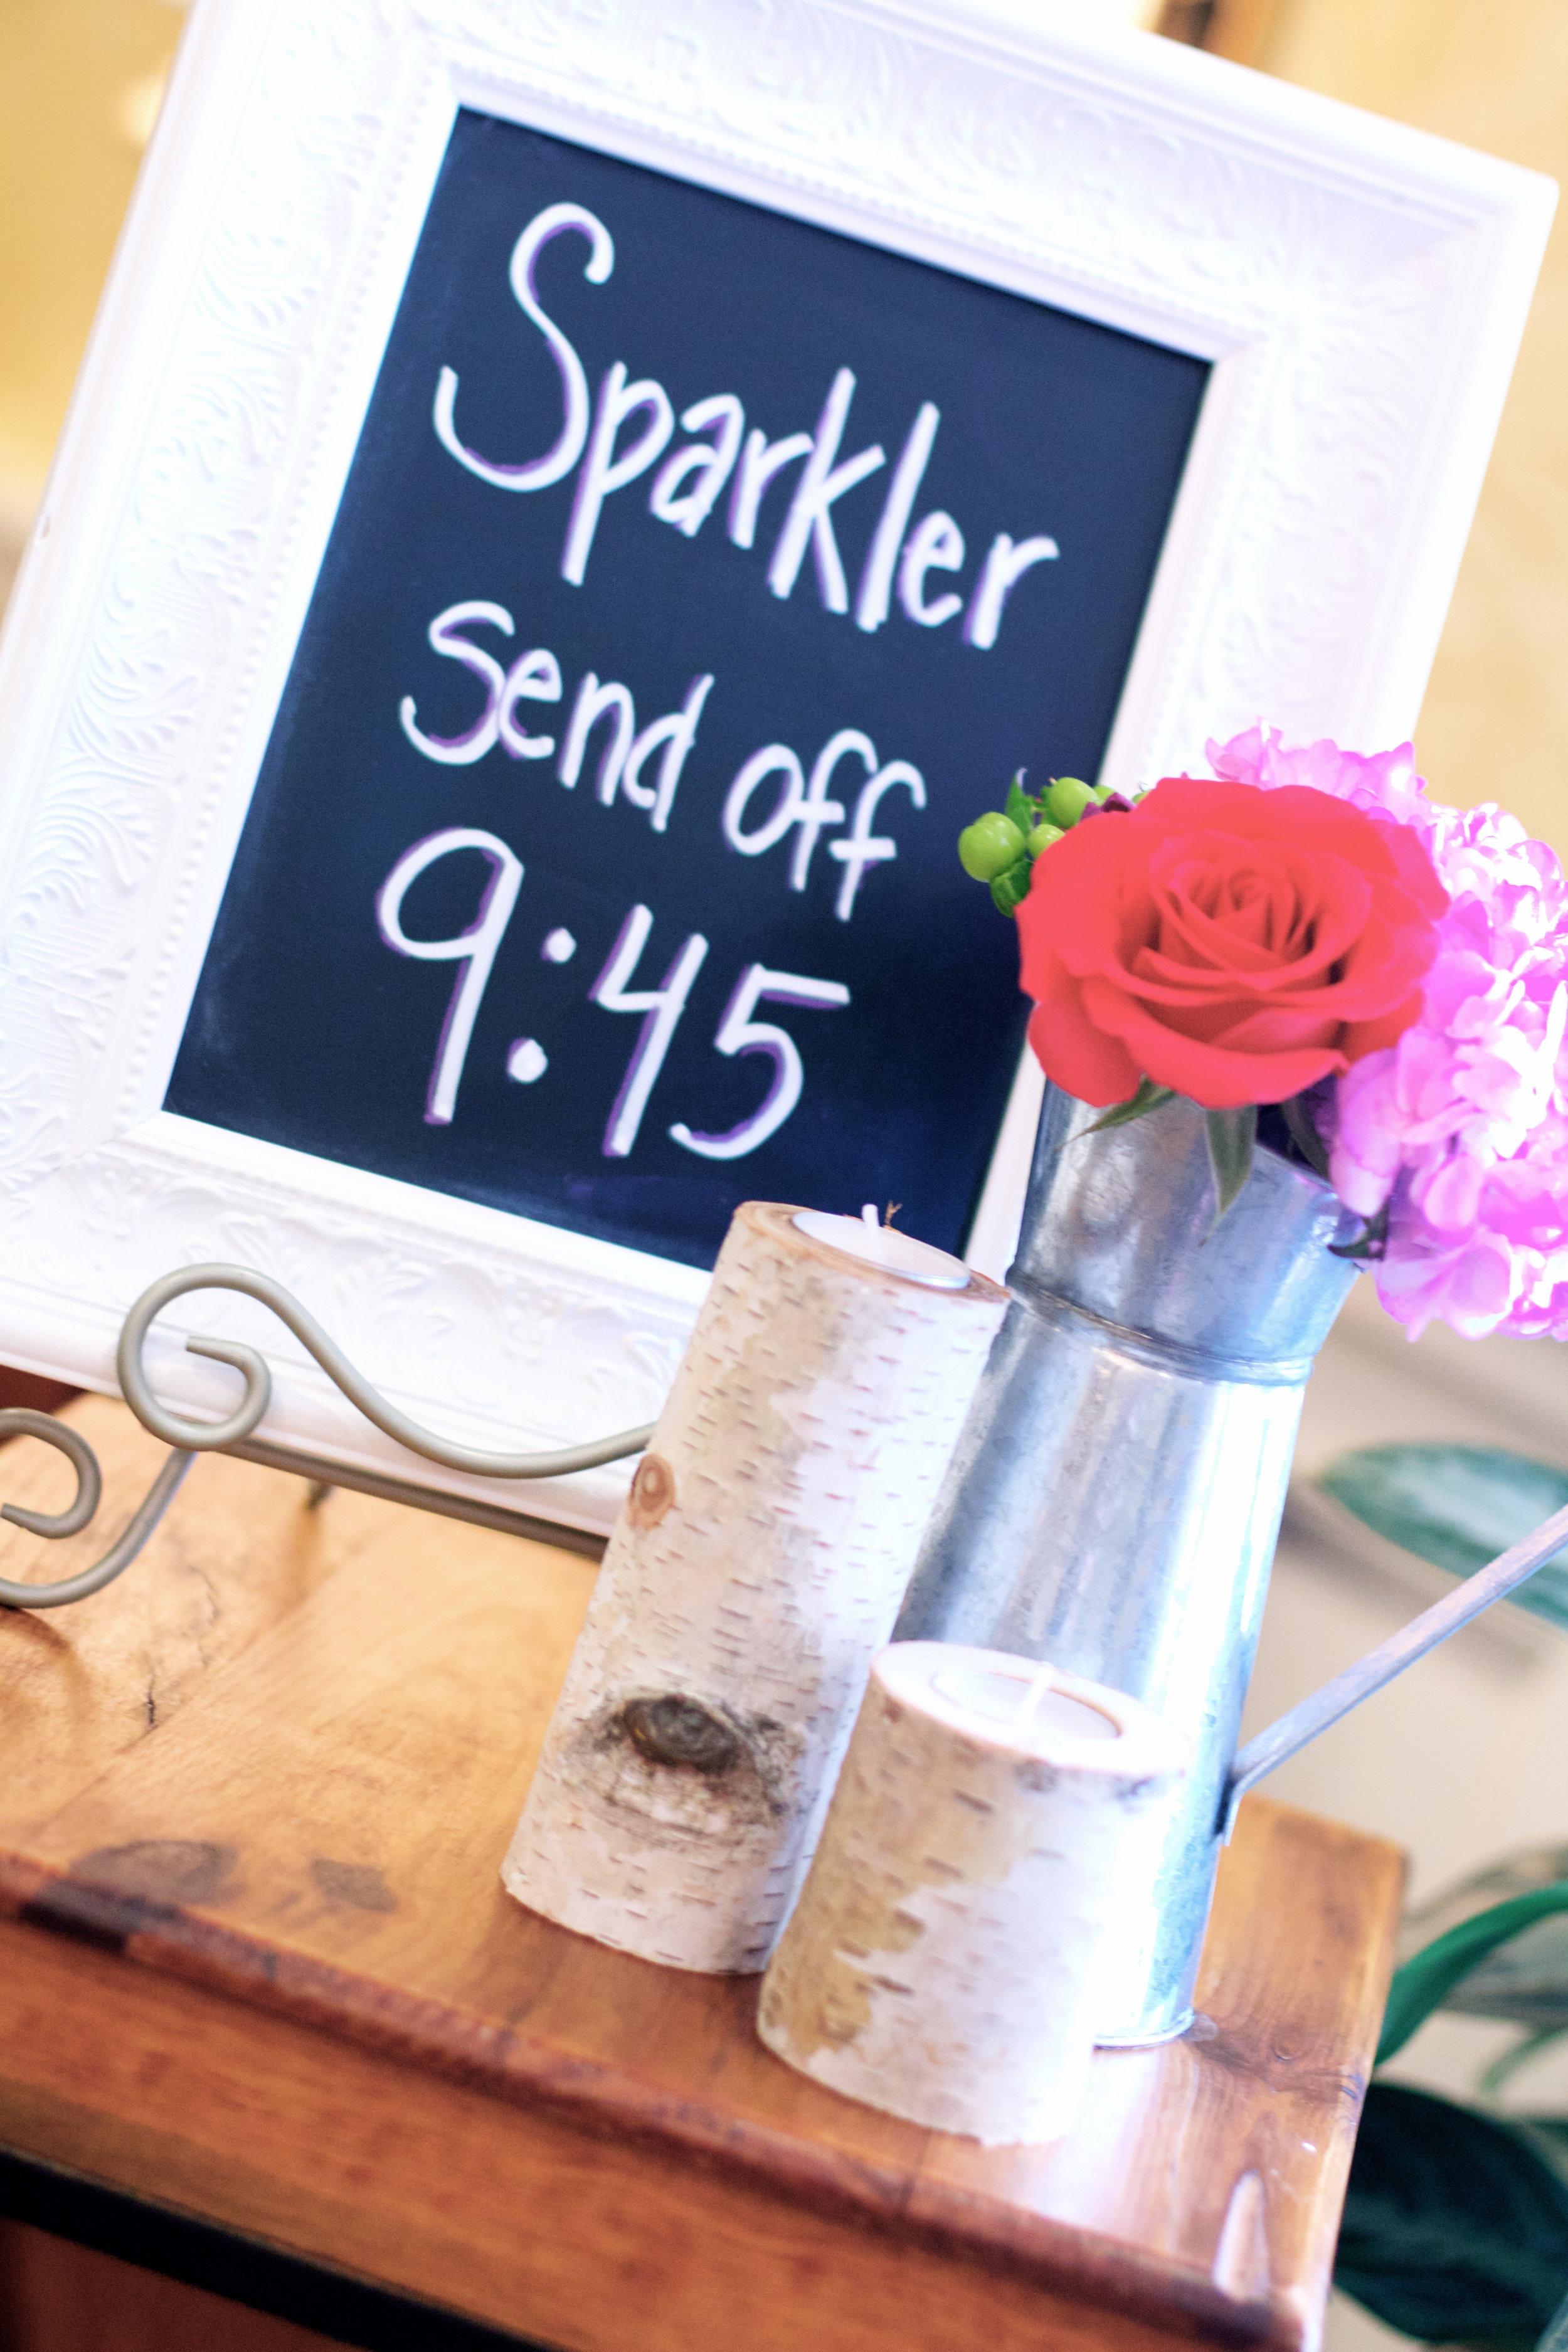 sparkler-sendoff-decor